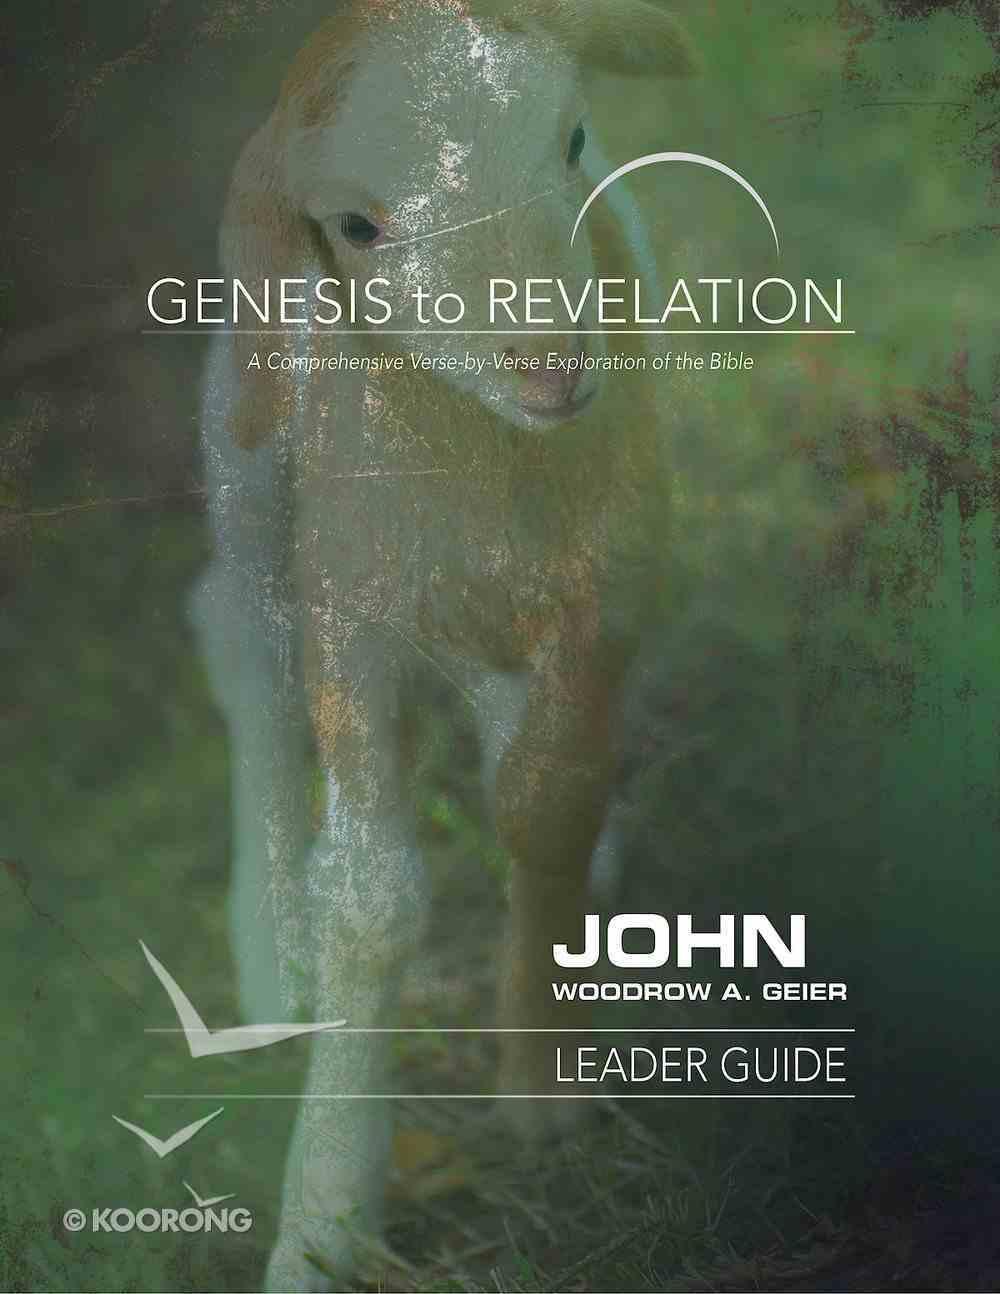 John (Leader Guide) (Genesis To Revelation Series) eBook